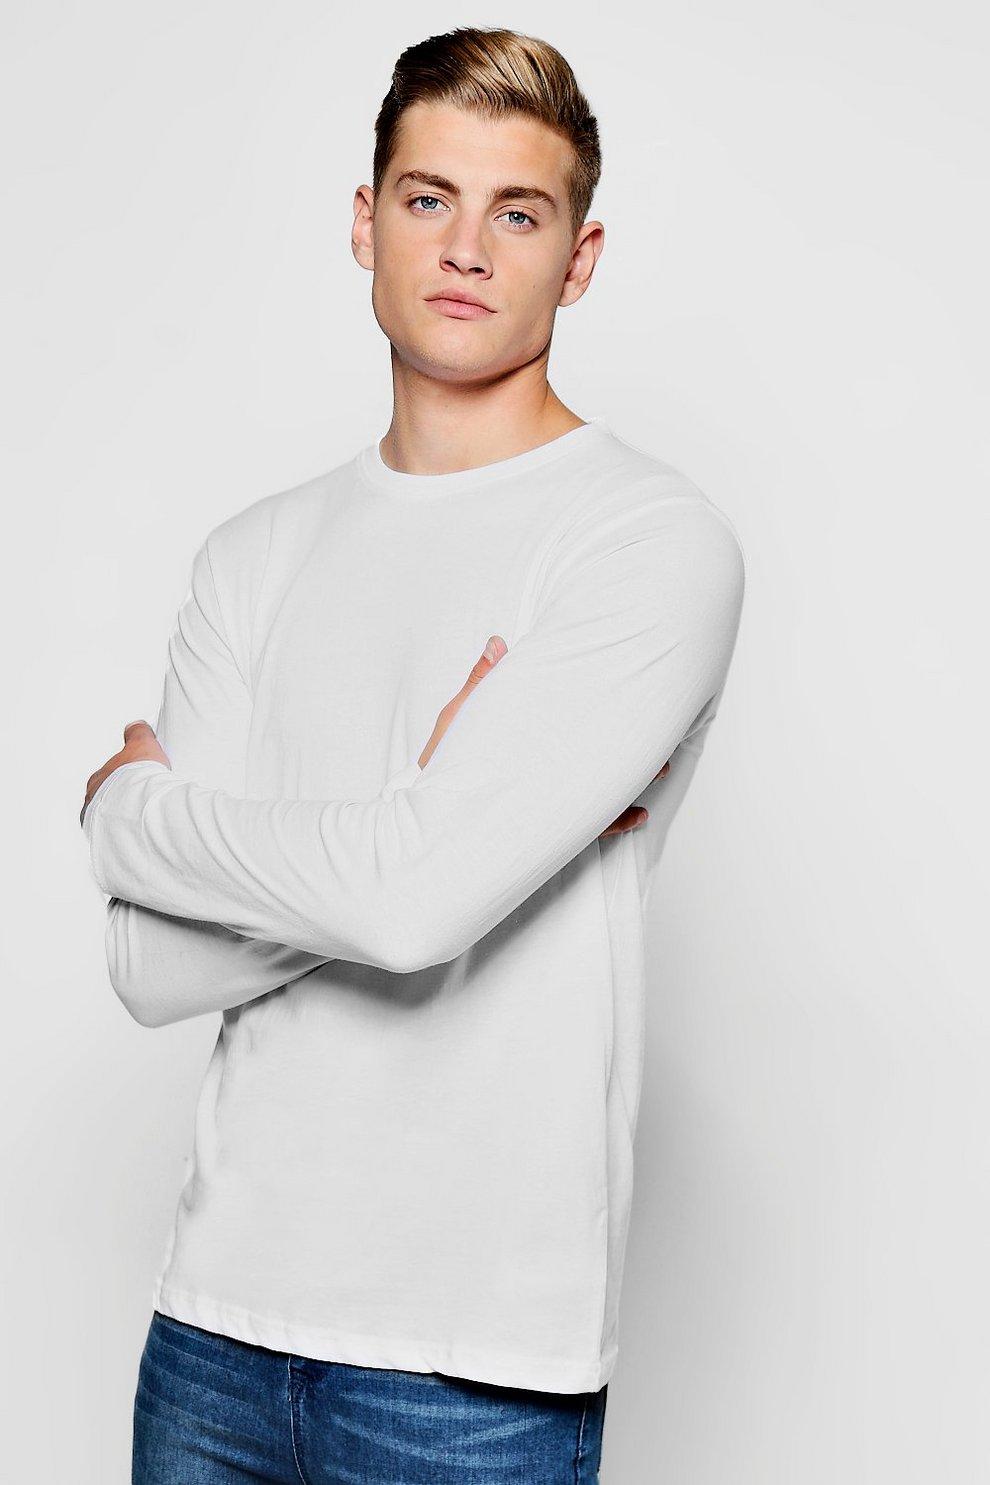 080041ffb0e969 Basic Long Sleeve Crew Neck T Shirt | Boohoo